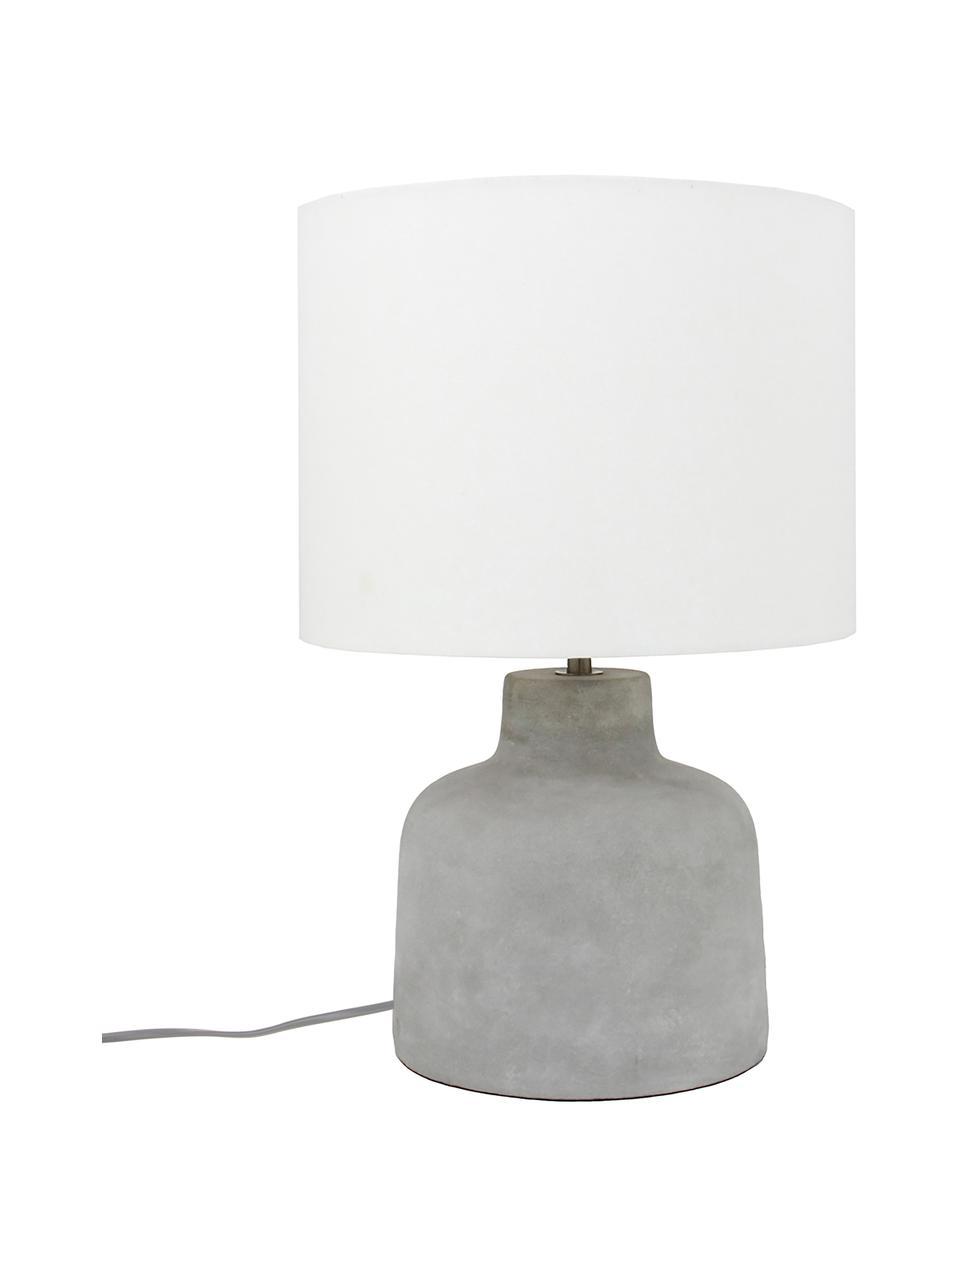 Lampe à poser moderne en béton Ike, Béton, blanc